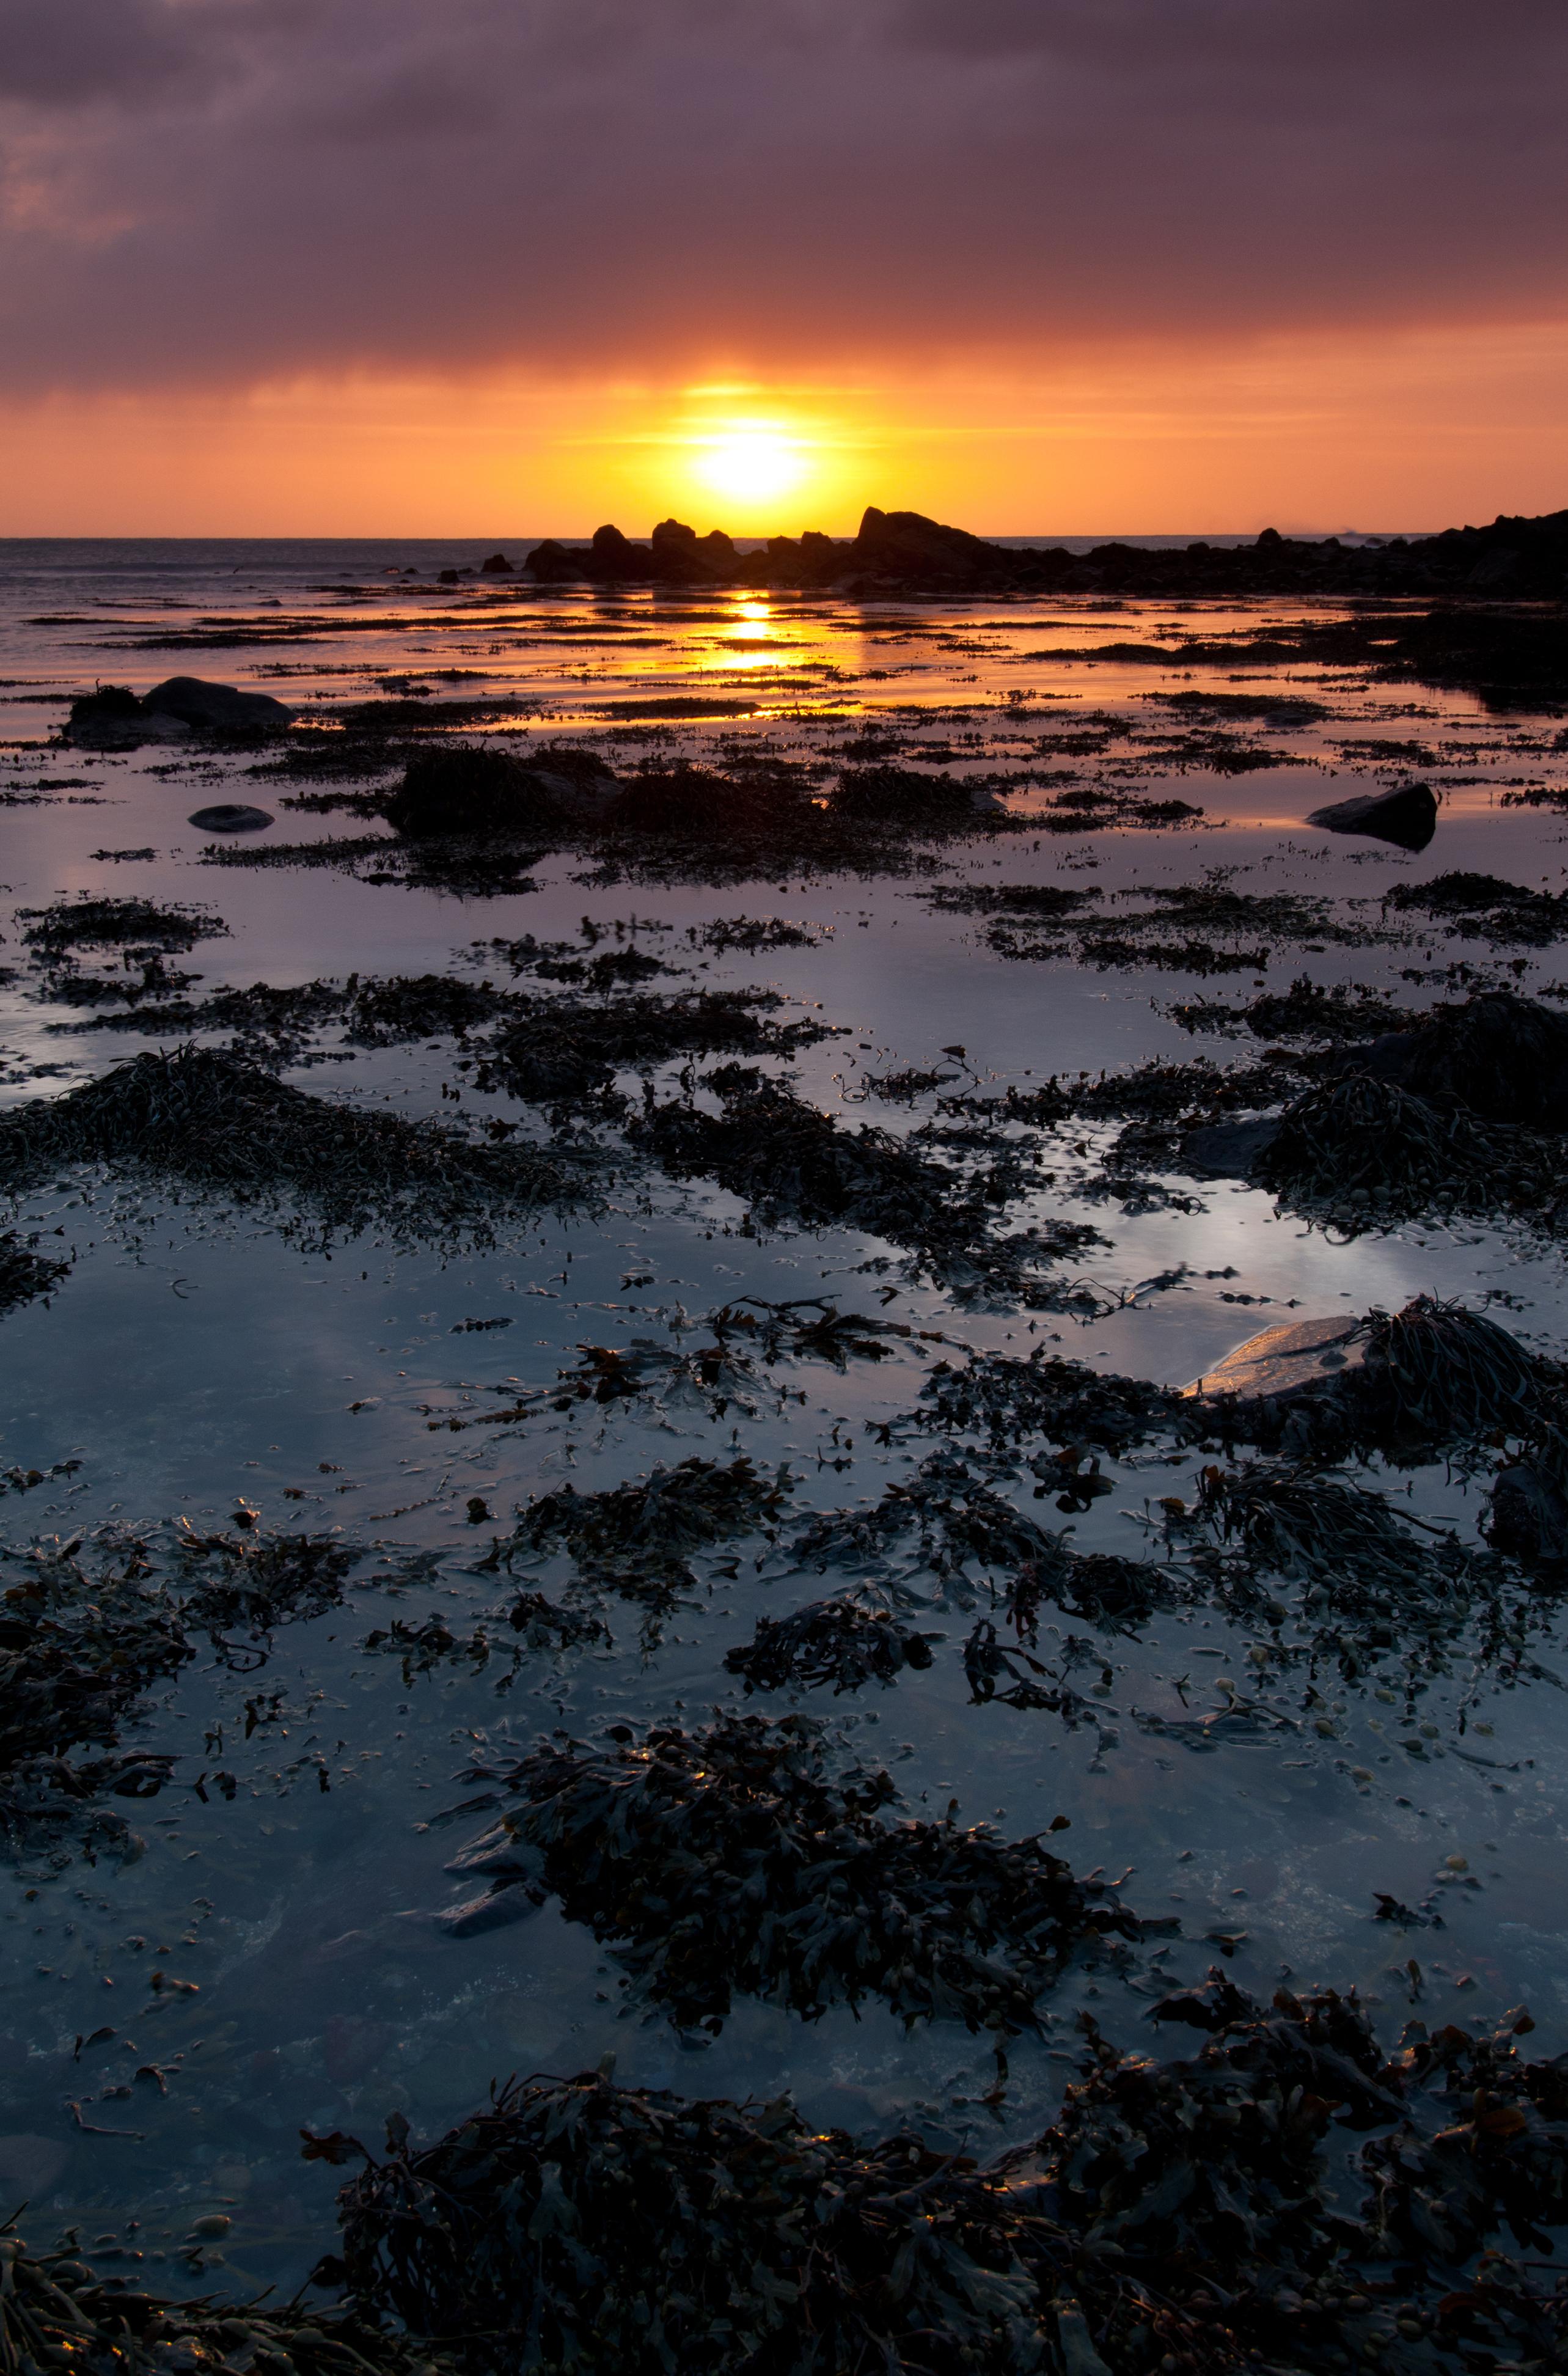 Rising Tide at Sunrise